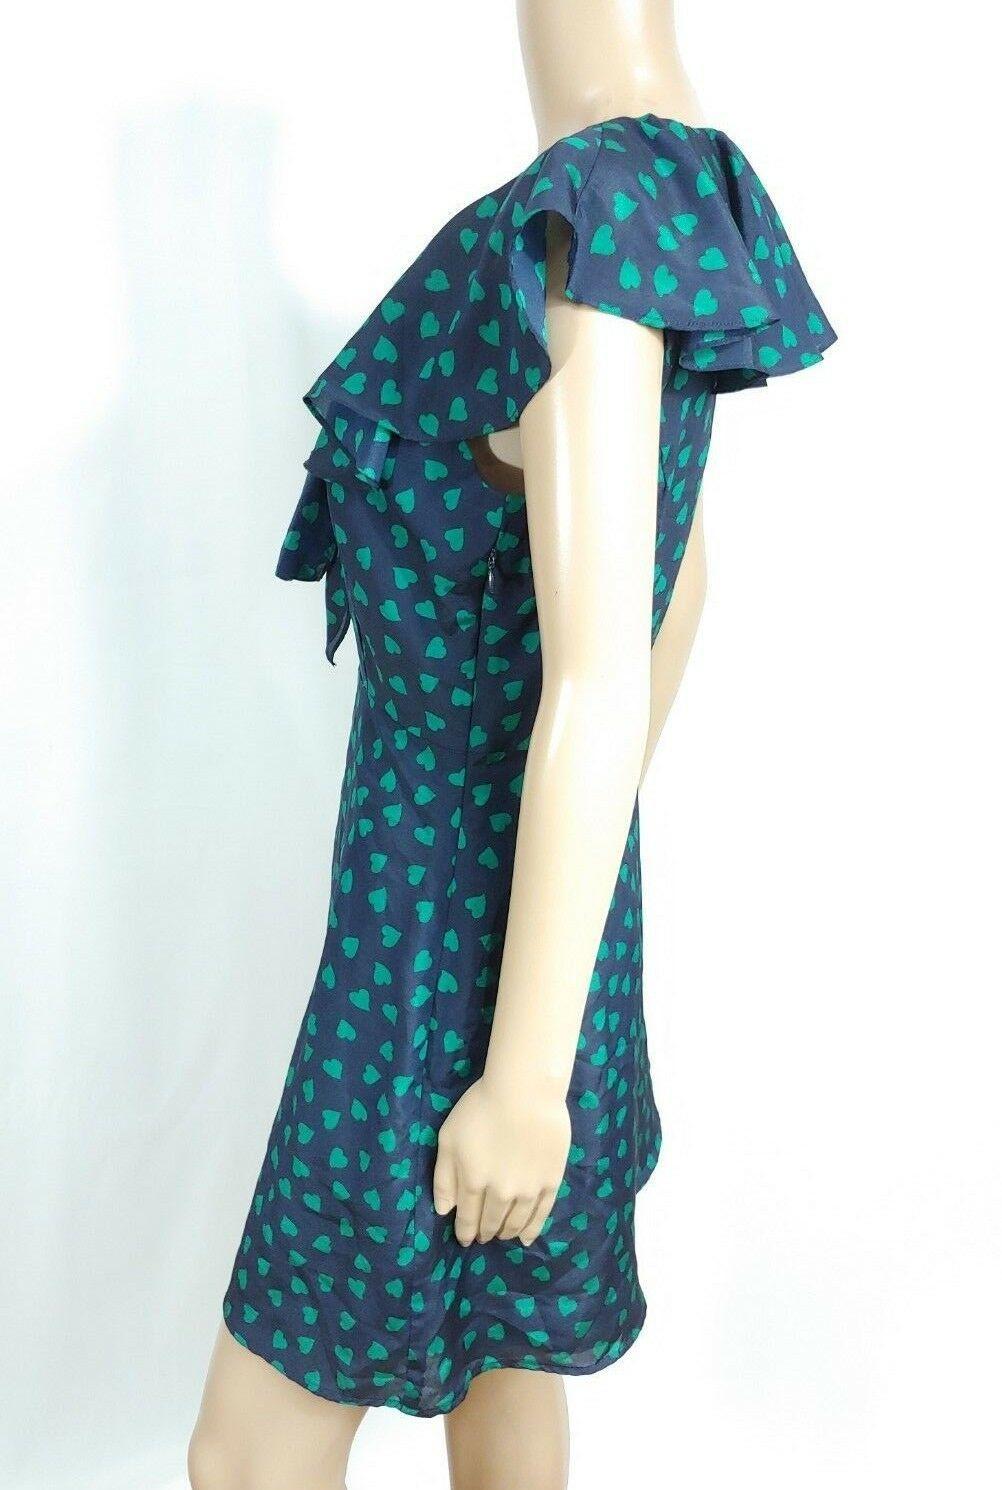 Forever 21 Navy Blue Green Heart Polka Dot Flutter Ascot Bow Tie Shirt Dress M